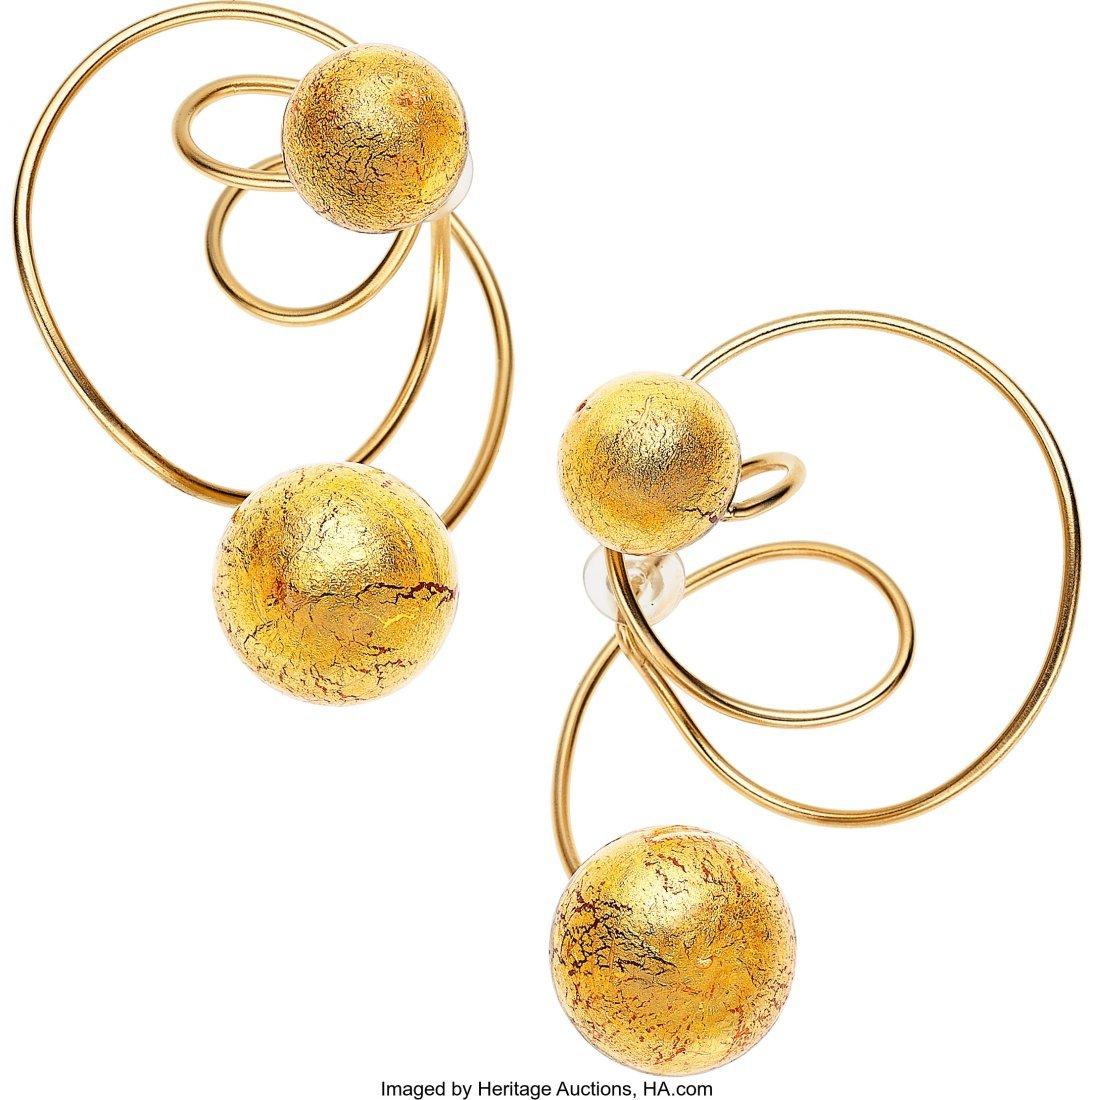 55073: Venetian Glass, Gold Leaf, Titanium Earrings, JA